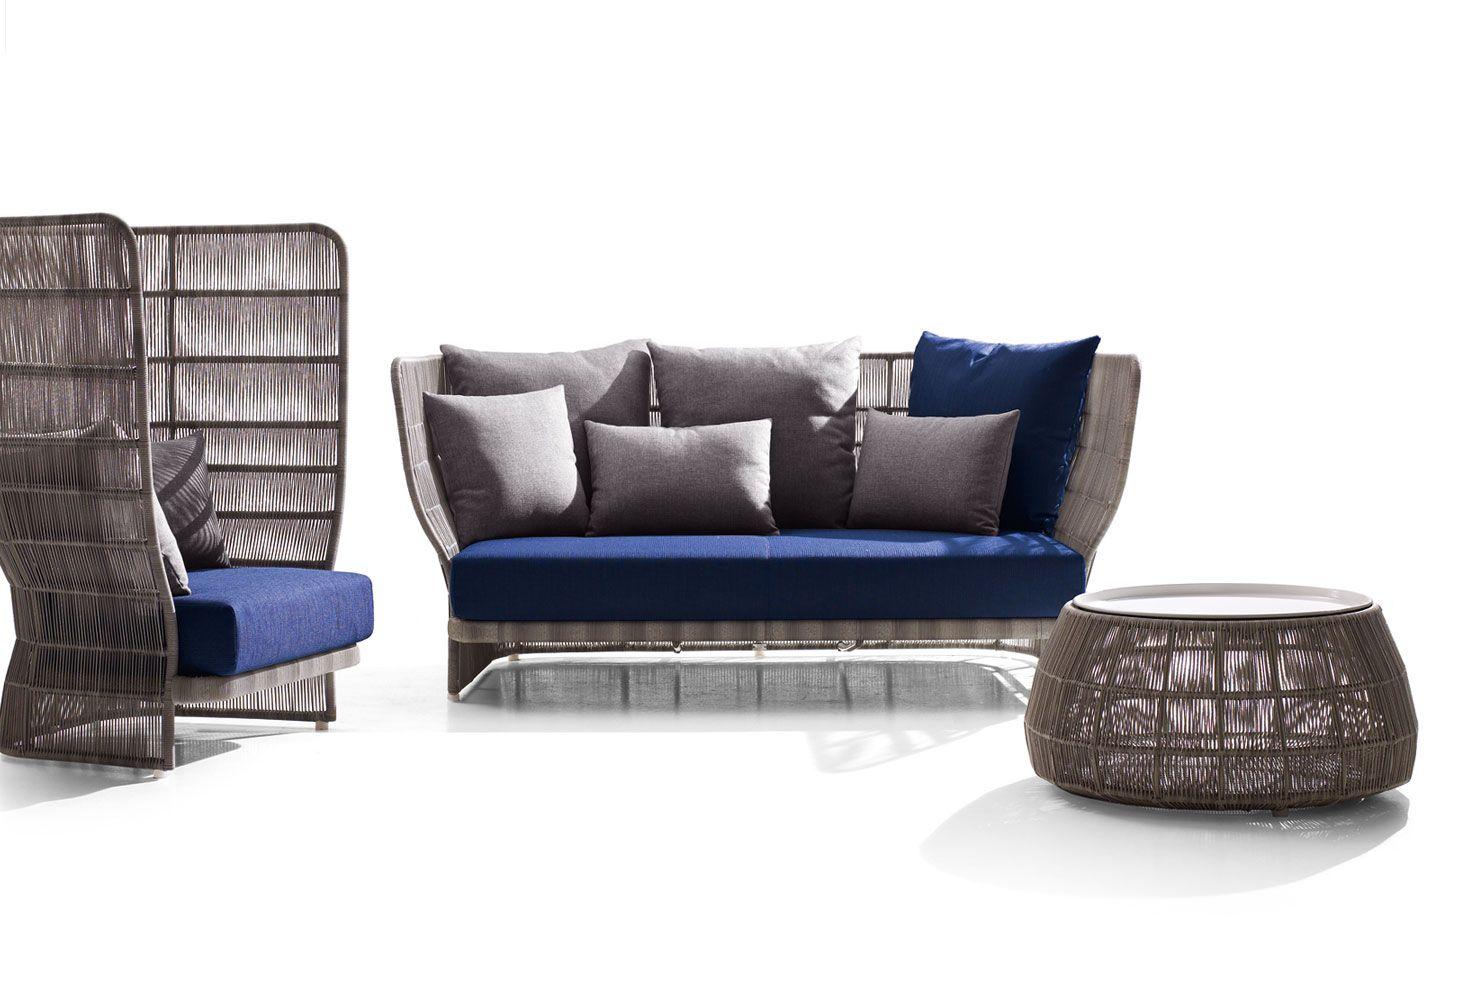 Canasta 39 13 garden sofa by b b italia outdoor a brand of for B b italia outdoor